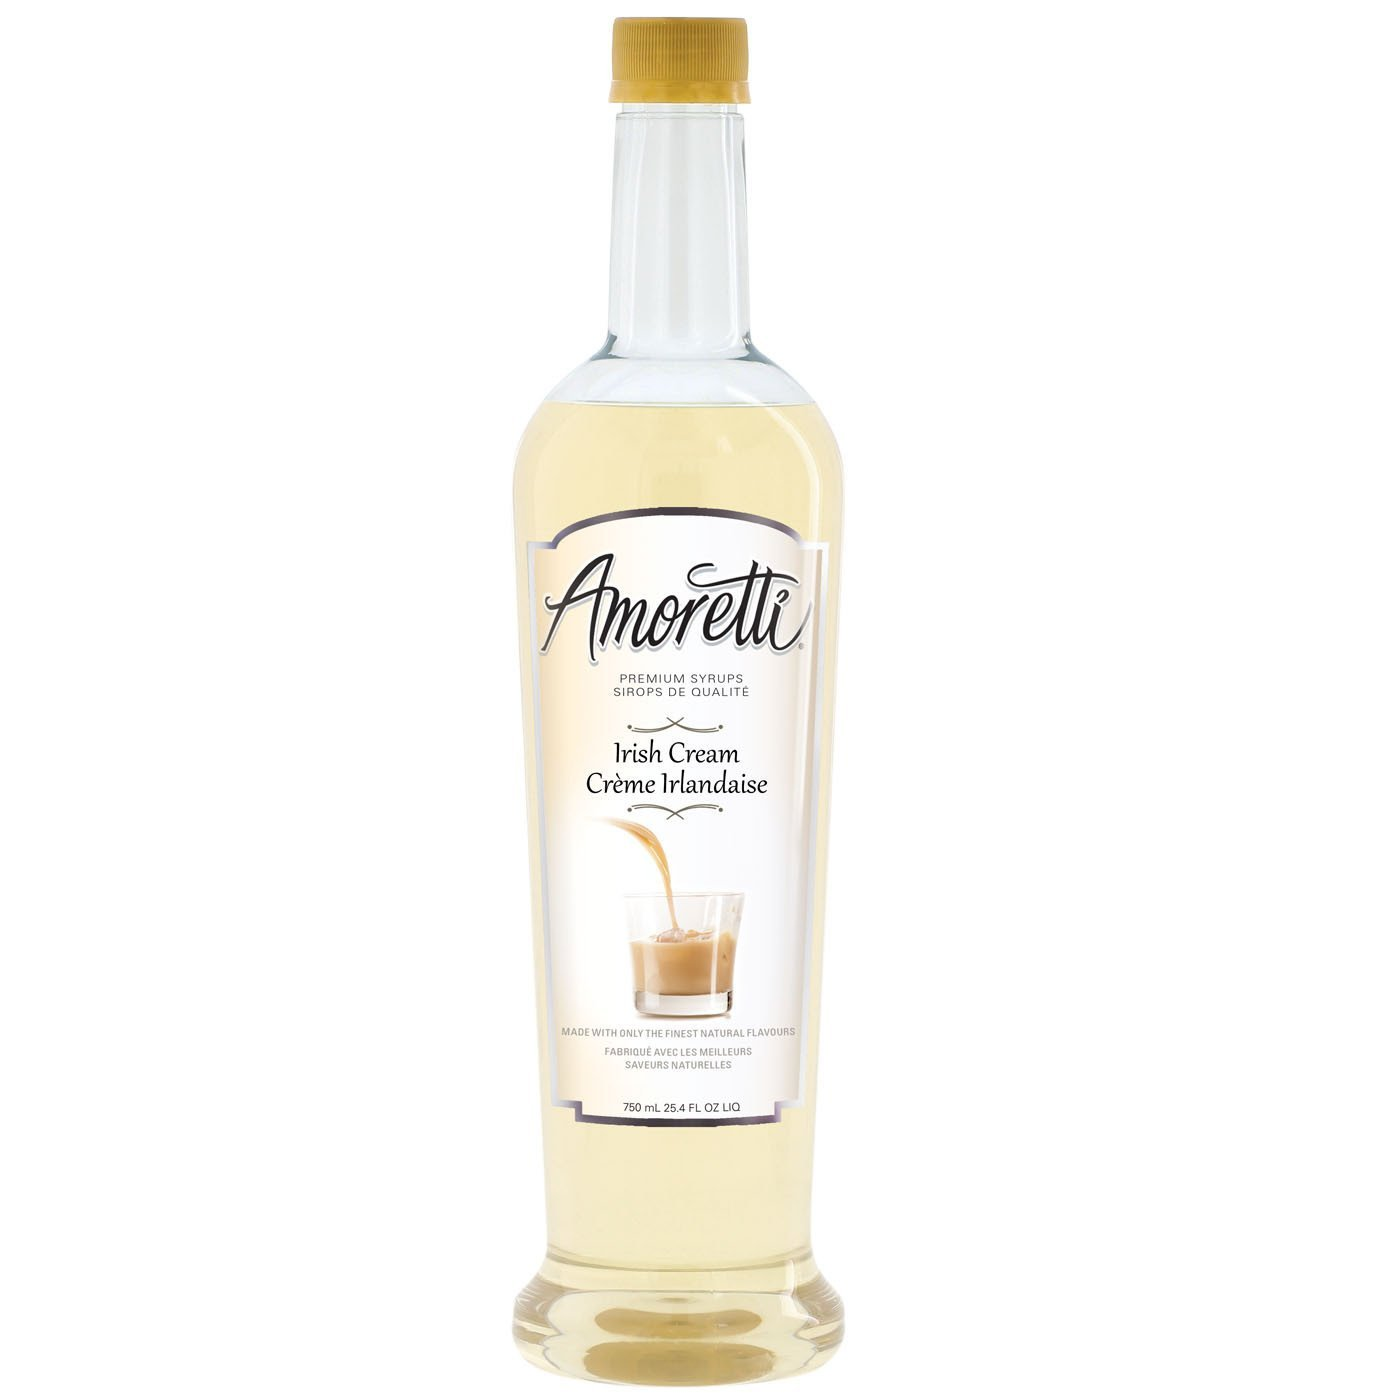 Amoretti Premium Syrup, Irish Cream, 25.4 Ounce by Amoretti (Image #1)